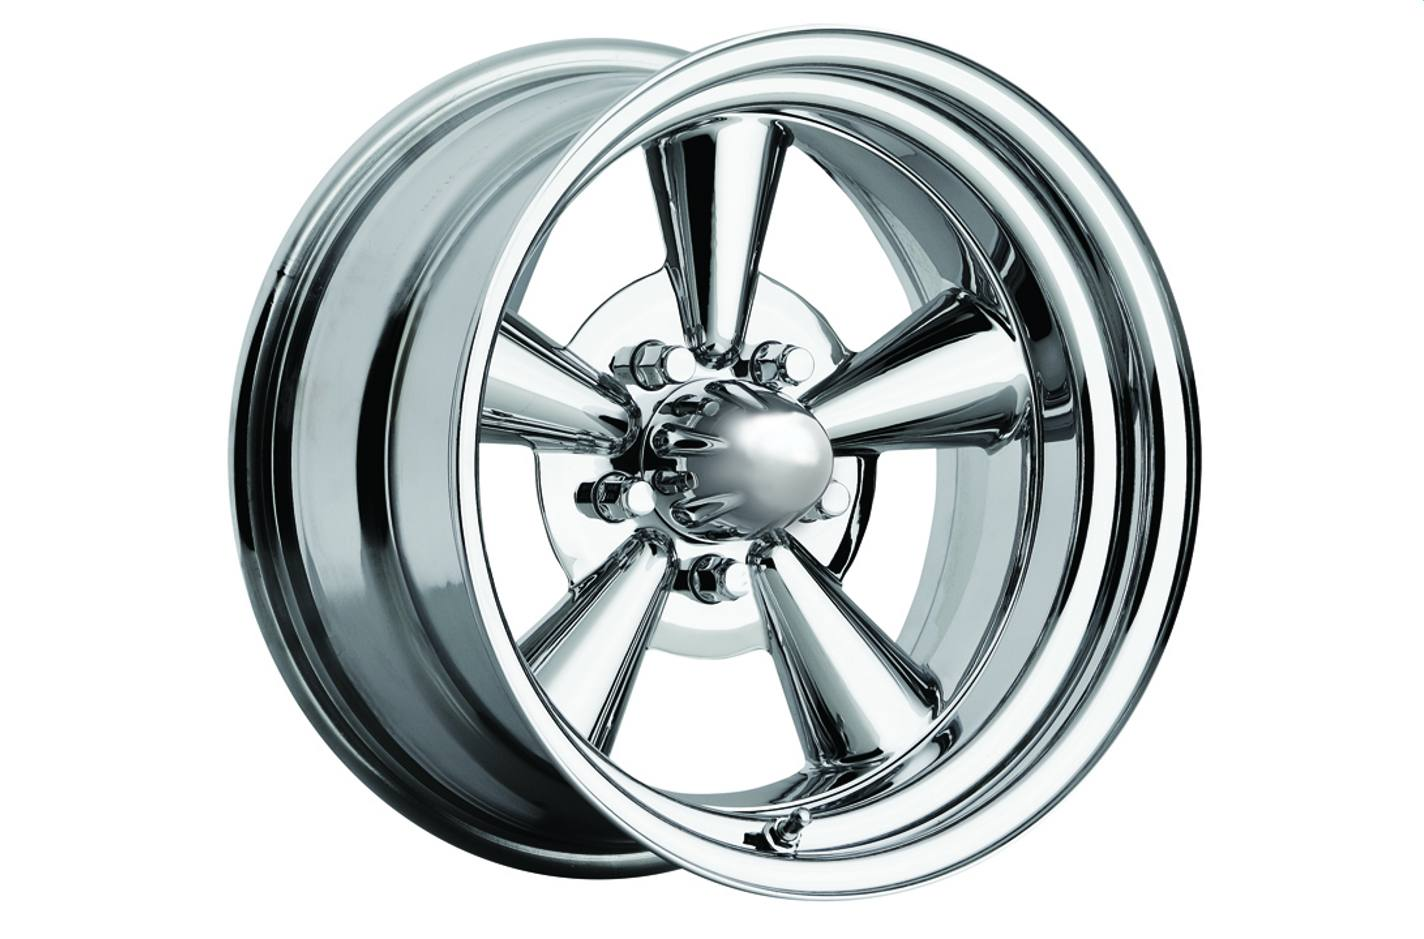 Cragar 377 Series Chrome Supreme Wheels For Sale In Fortuna, CA